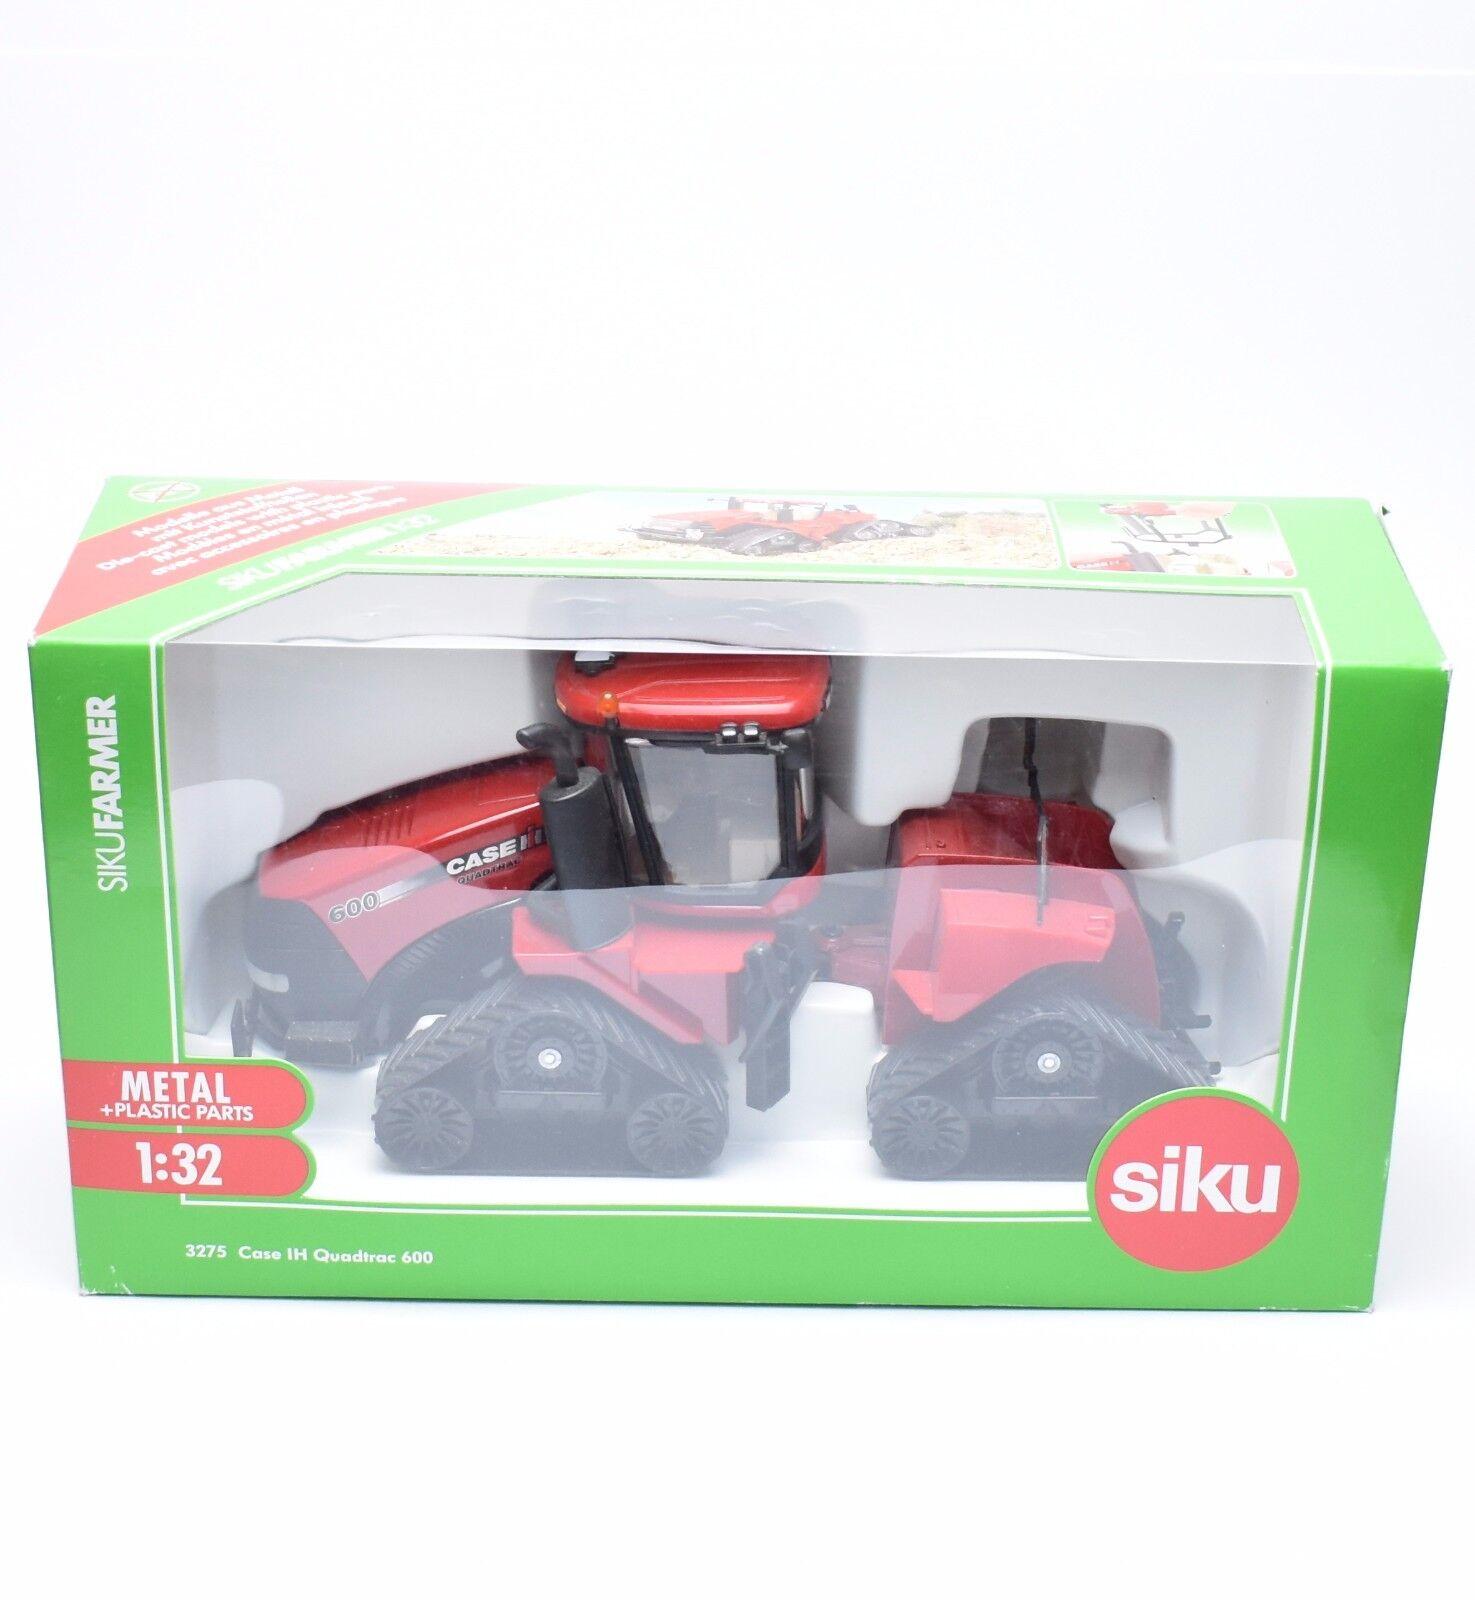 1 32 Siku 3275 FARMER Case IH Quadtrac 600, neuf dans sa boîte, k047